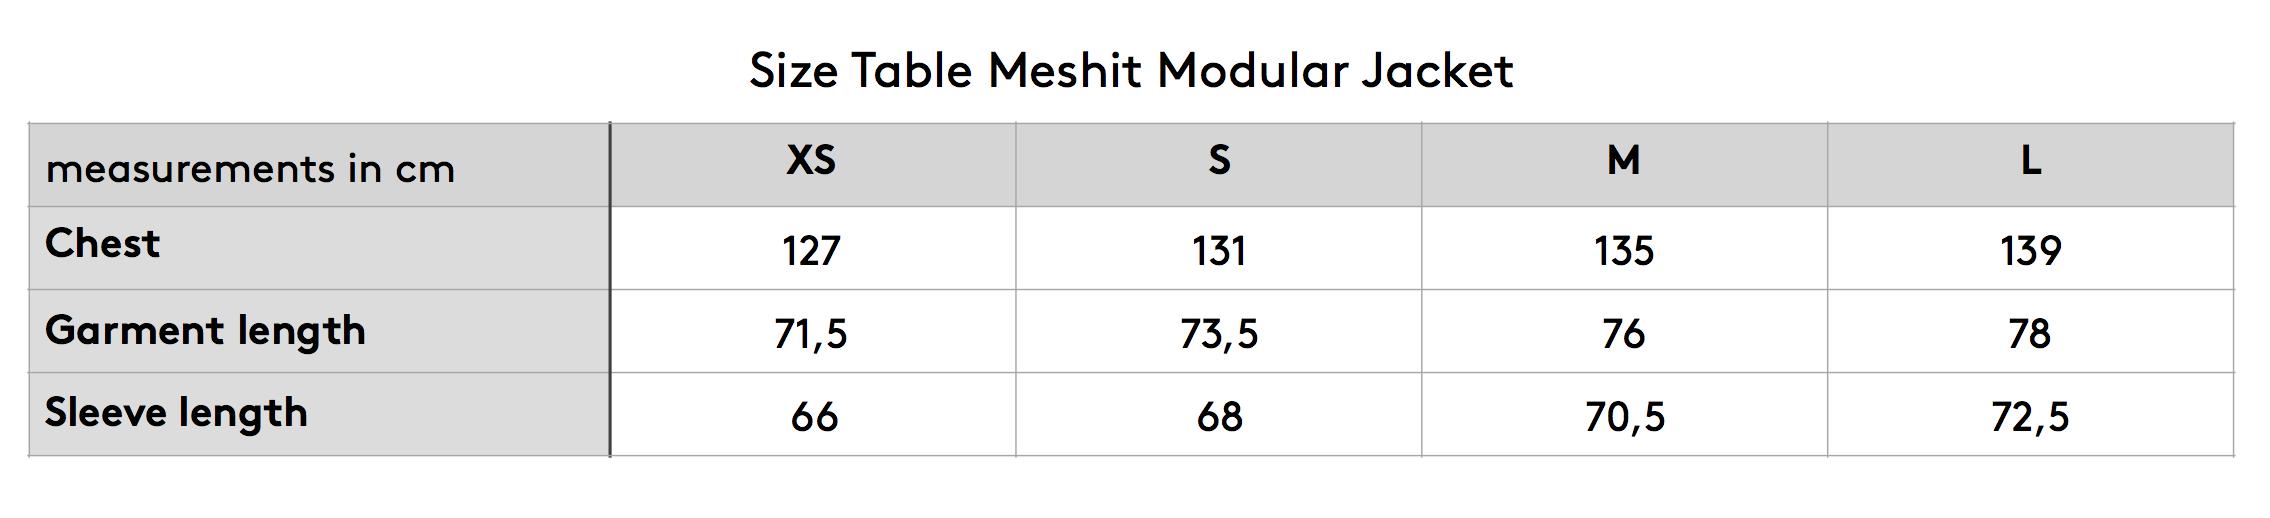 MESHIT_JACKET_MEASUREMENTS.png